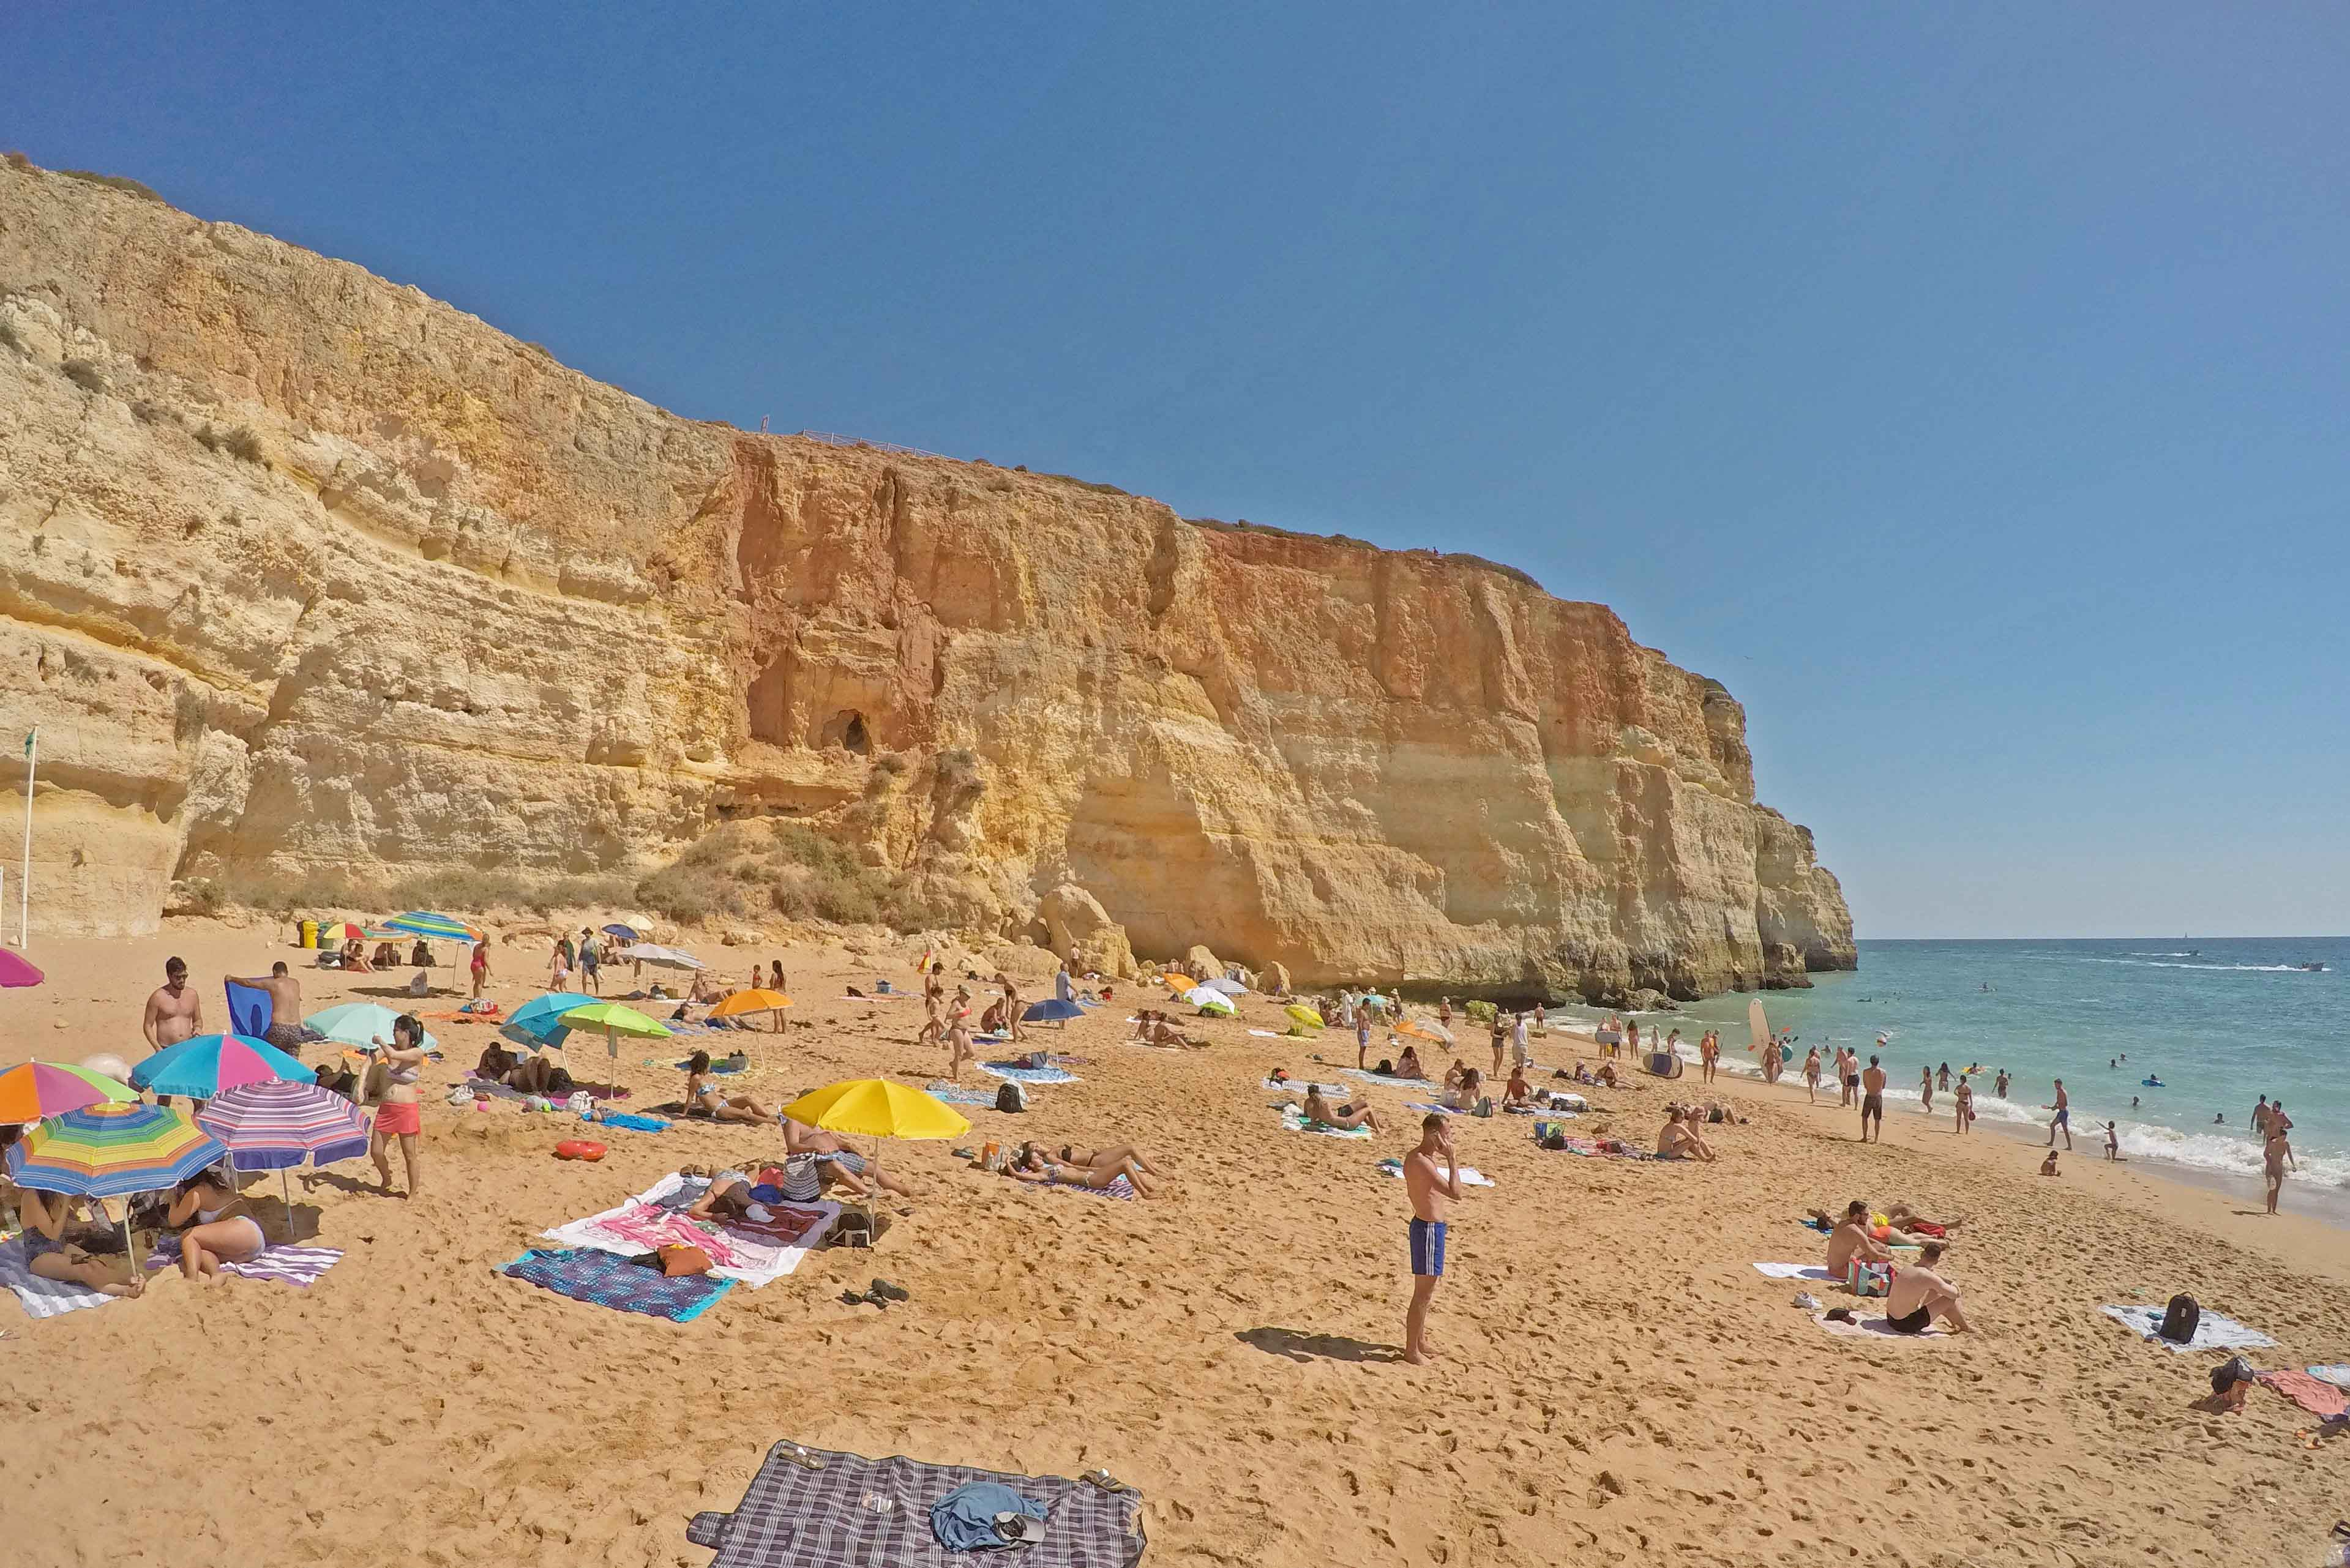 dicas do algarve portugal praia benagil